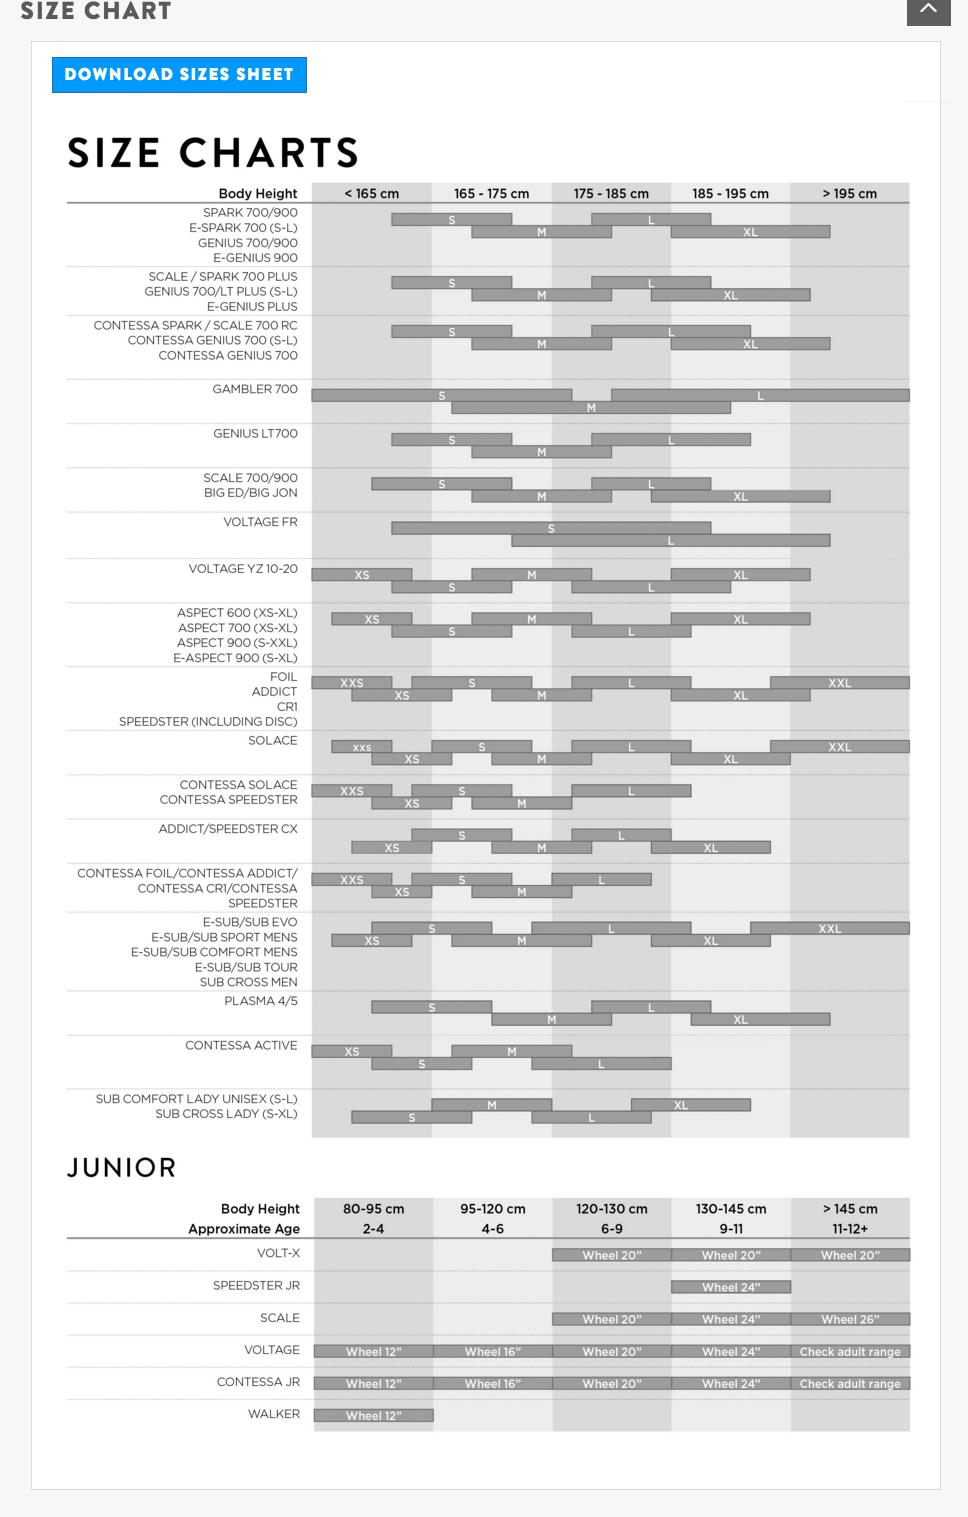 scott-size-chart.png